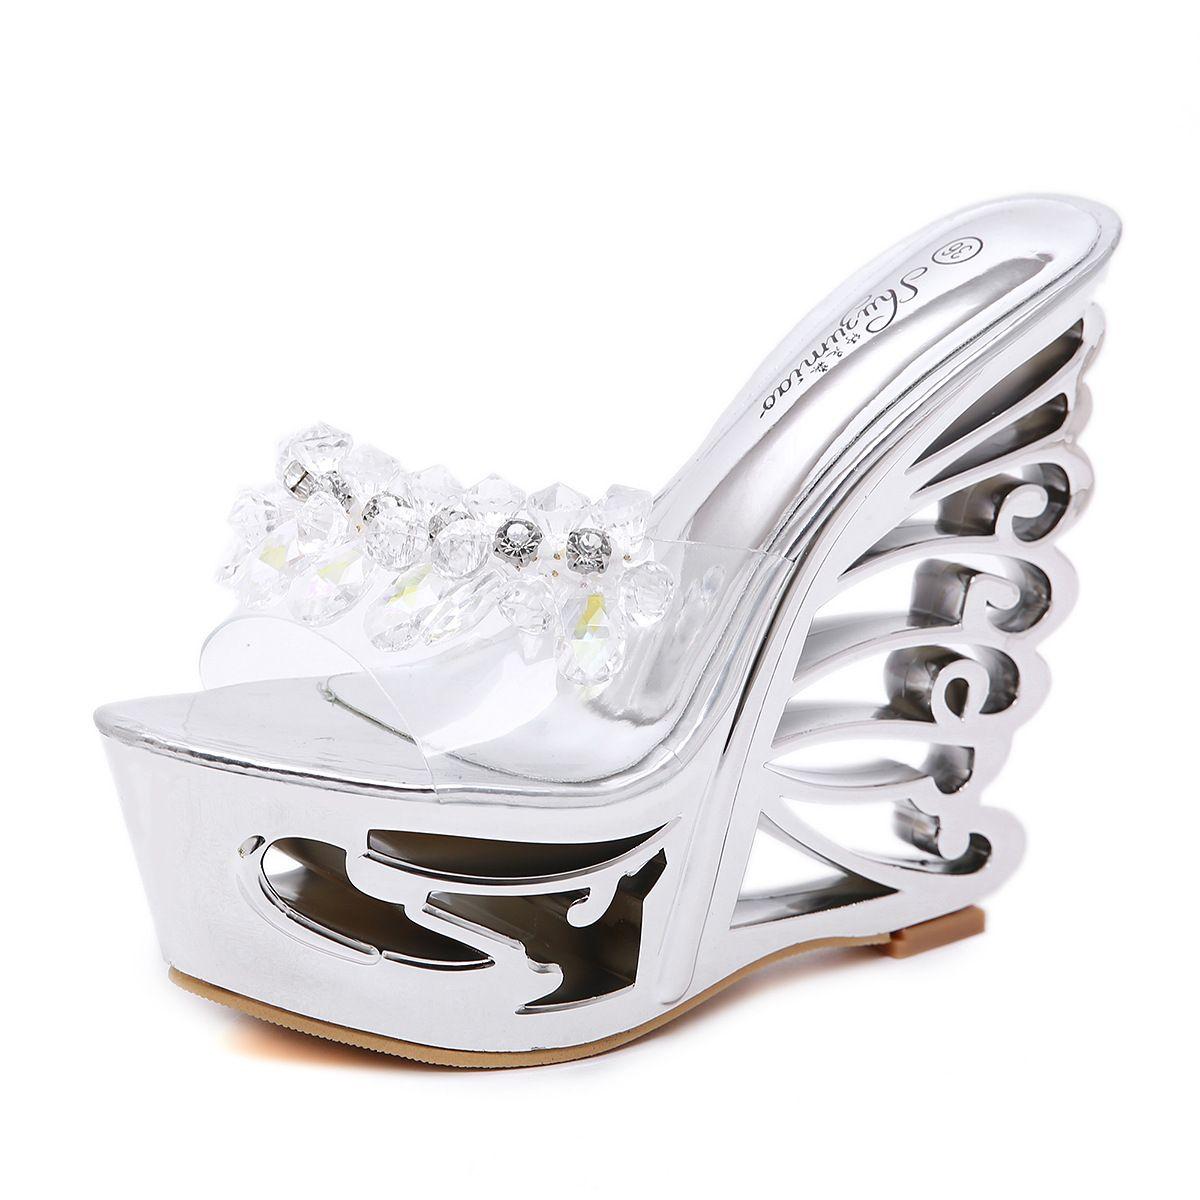 7bd17d9f8cea Women Platform Sandals High Heels Summer Shoes Peep Toe Women Wedge Sandals  Slippers Gold Silver Beads Heels Women Sandals White Sandals Wedge Heels  From ...